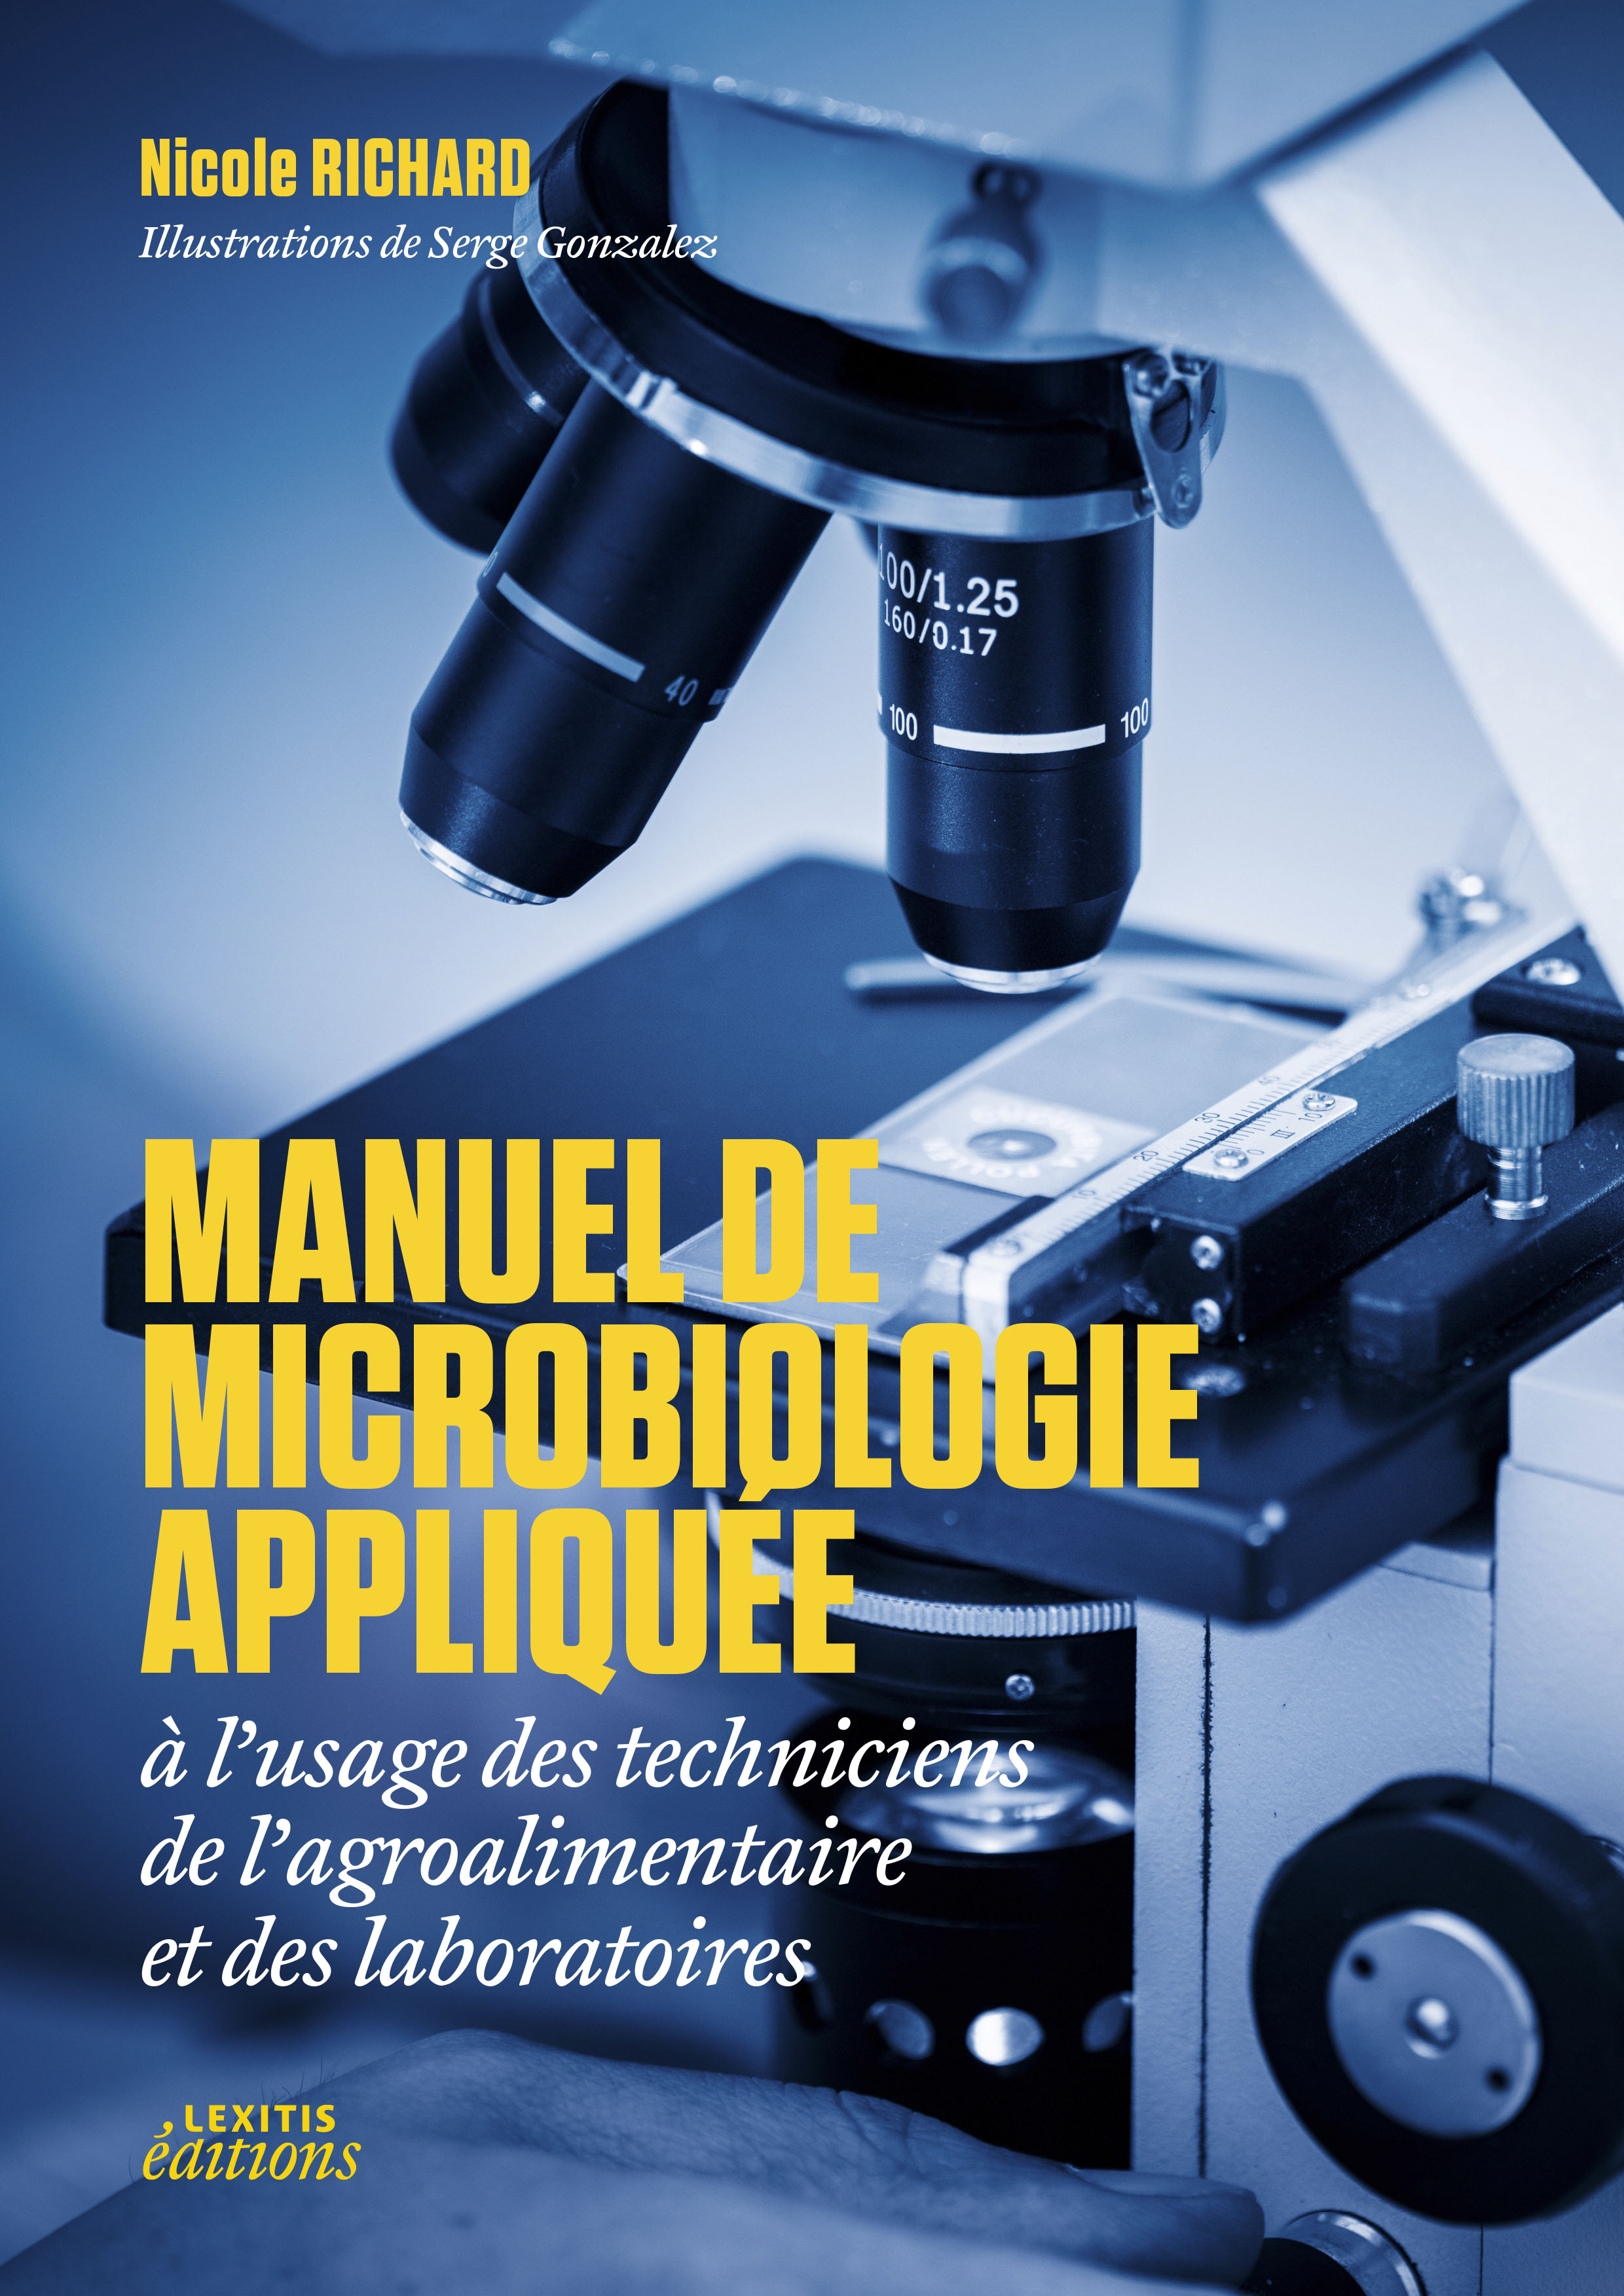 Rencontre microbiologie a3p